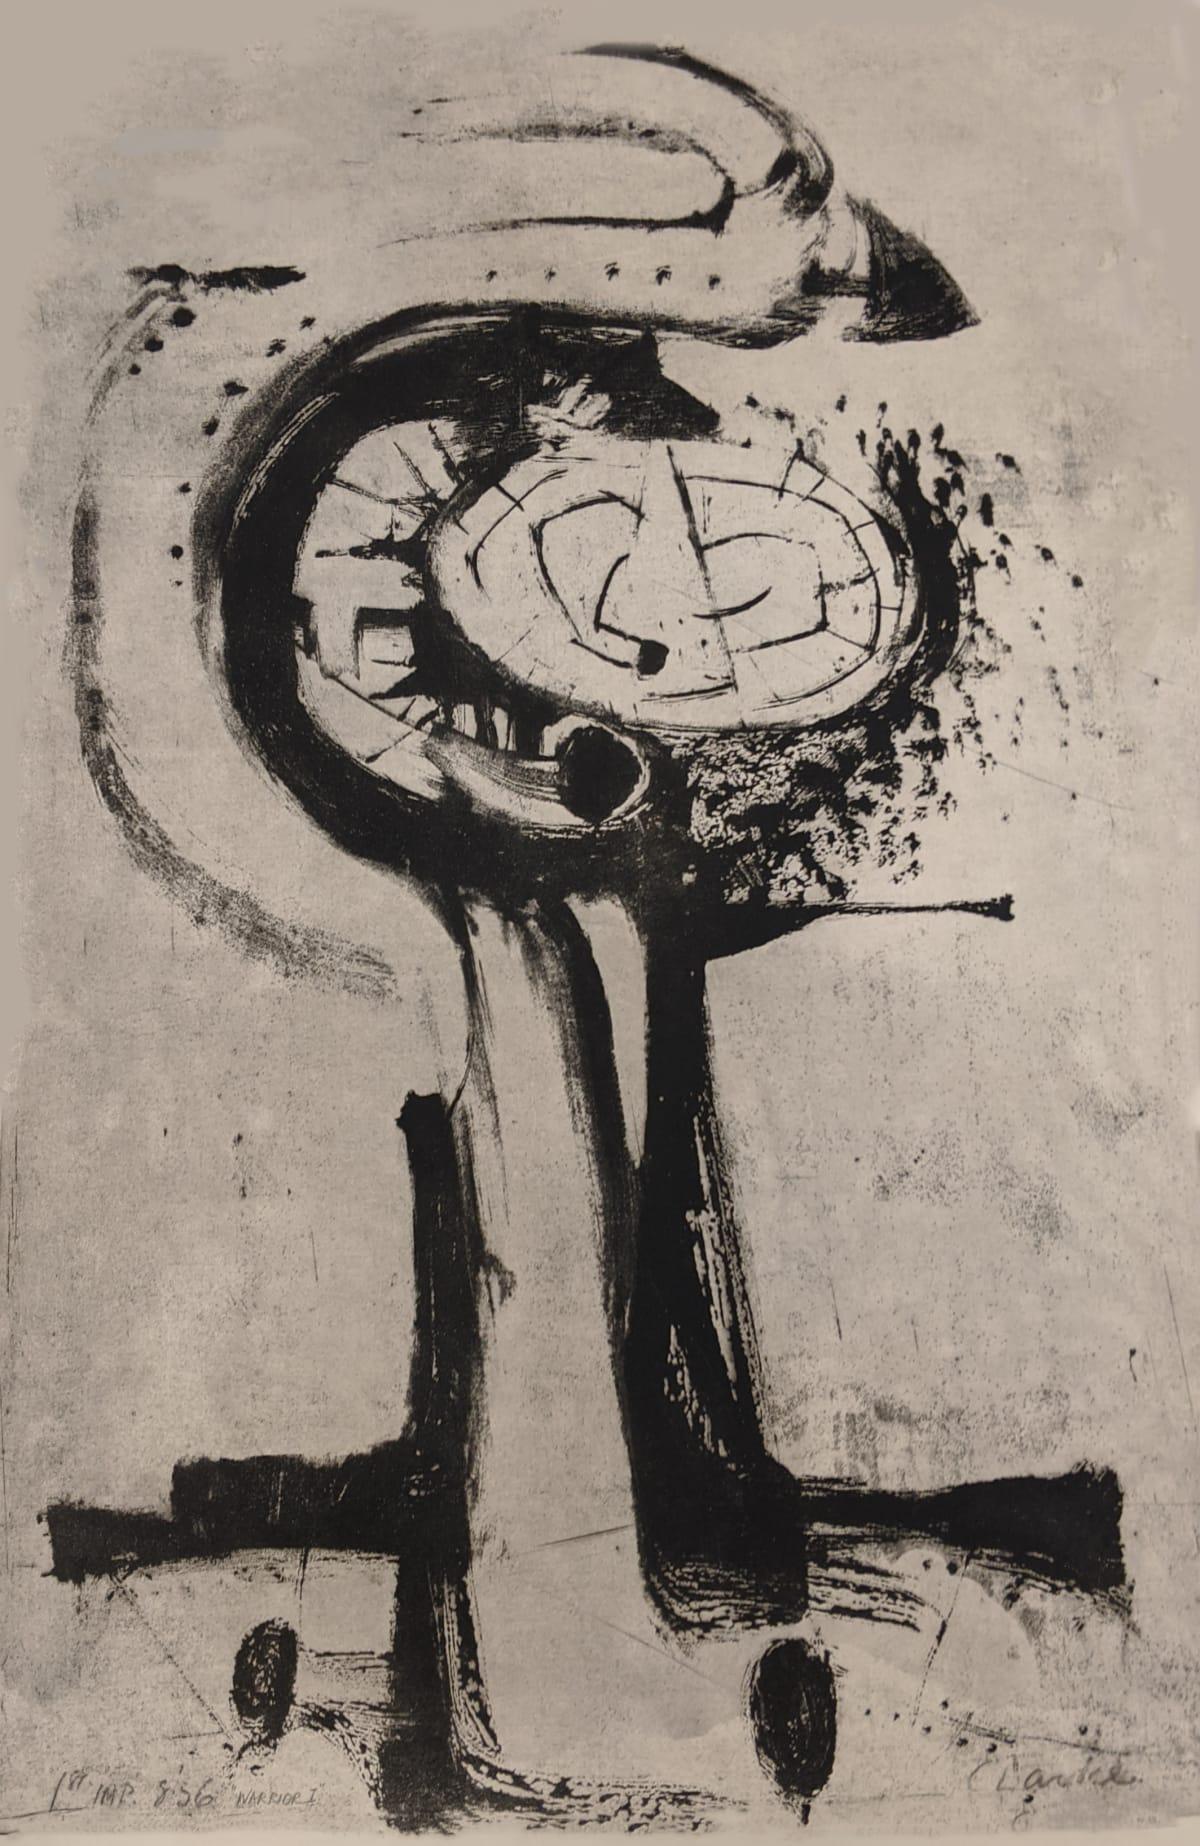 Geoffrey Clarke, Warrior I (181), 1956